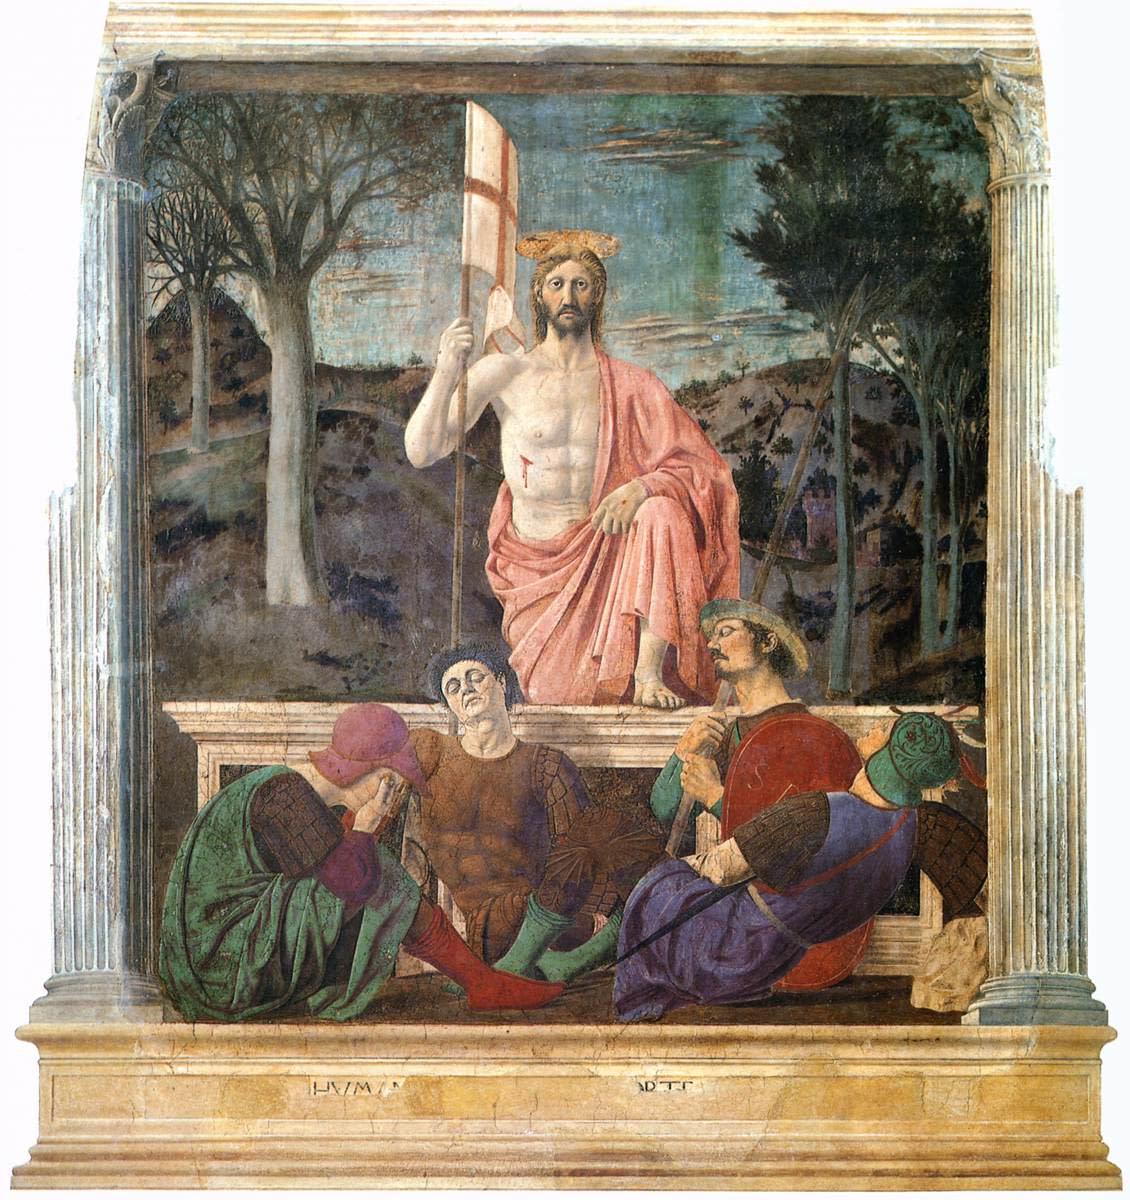 Piero della Francesca, Resurrection of Jesus Christ (1450 - 1463), Sansepolcro (AR) Museo Civico